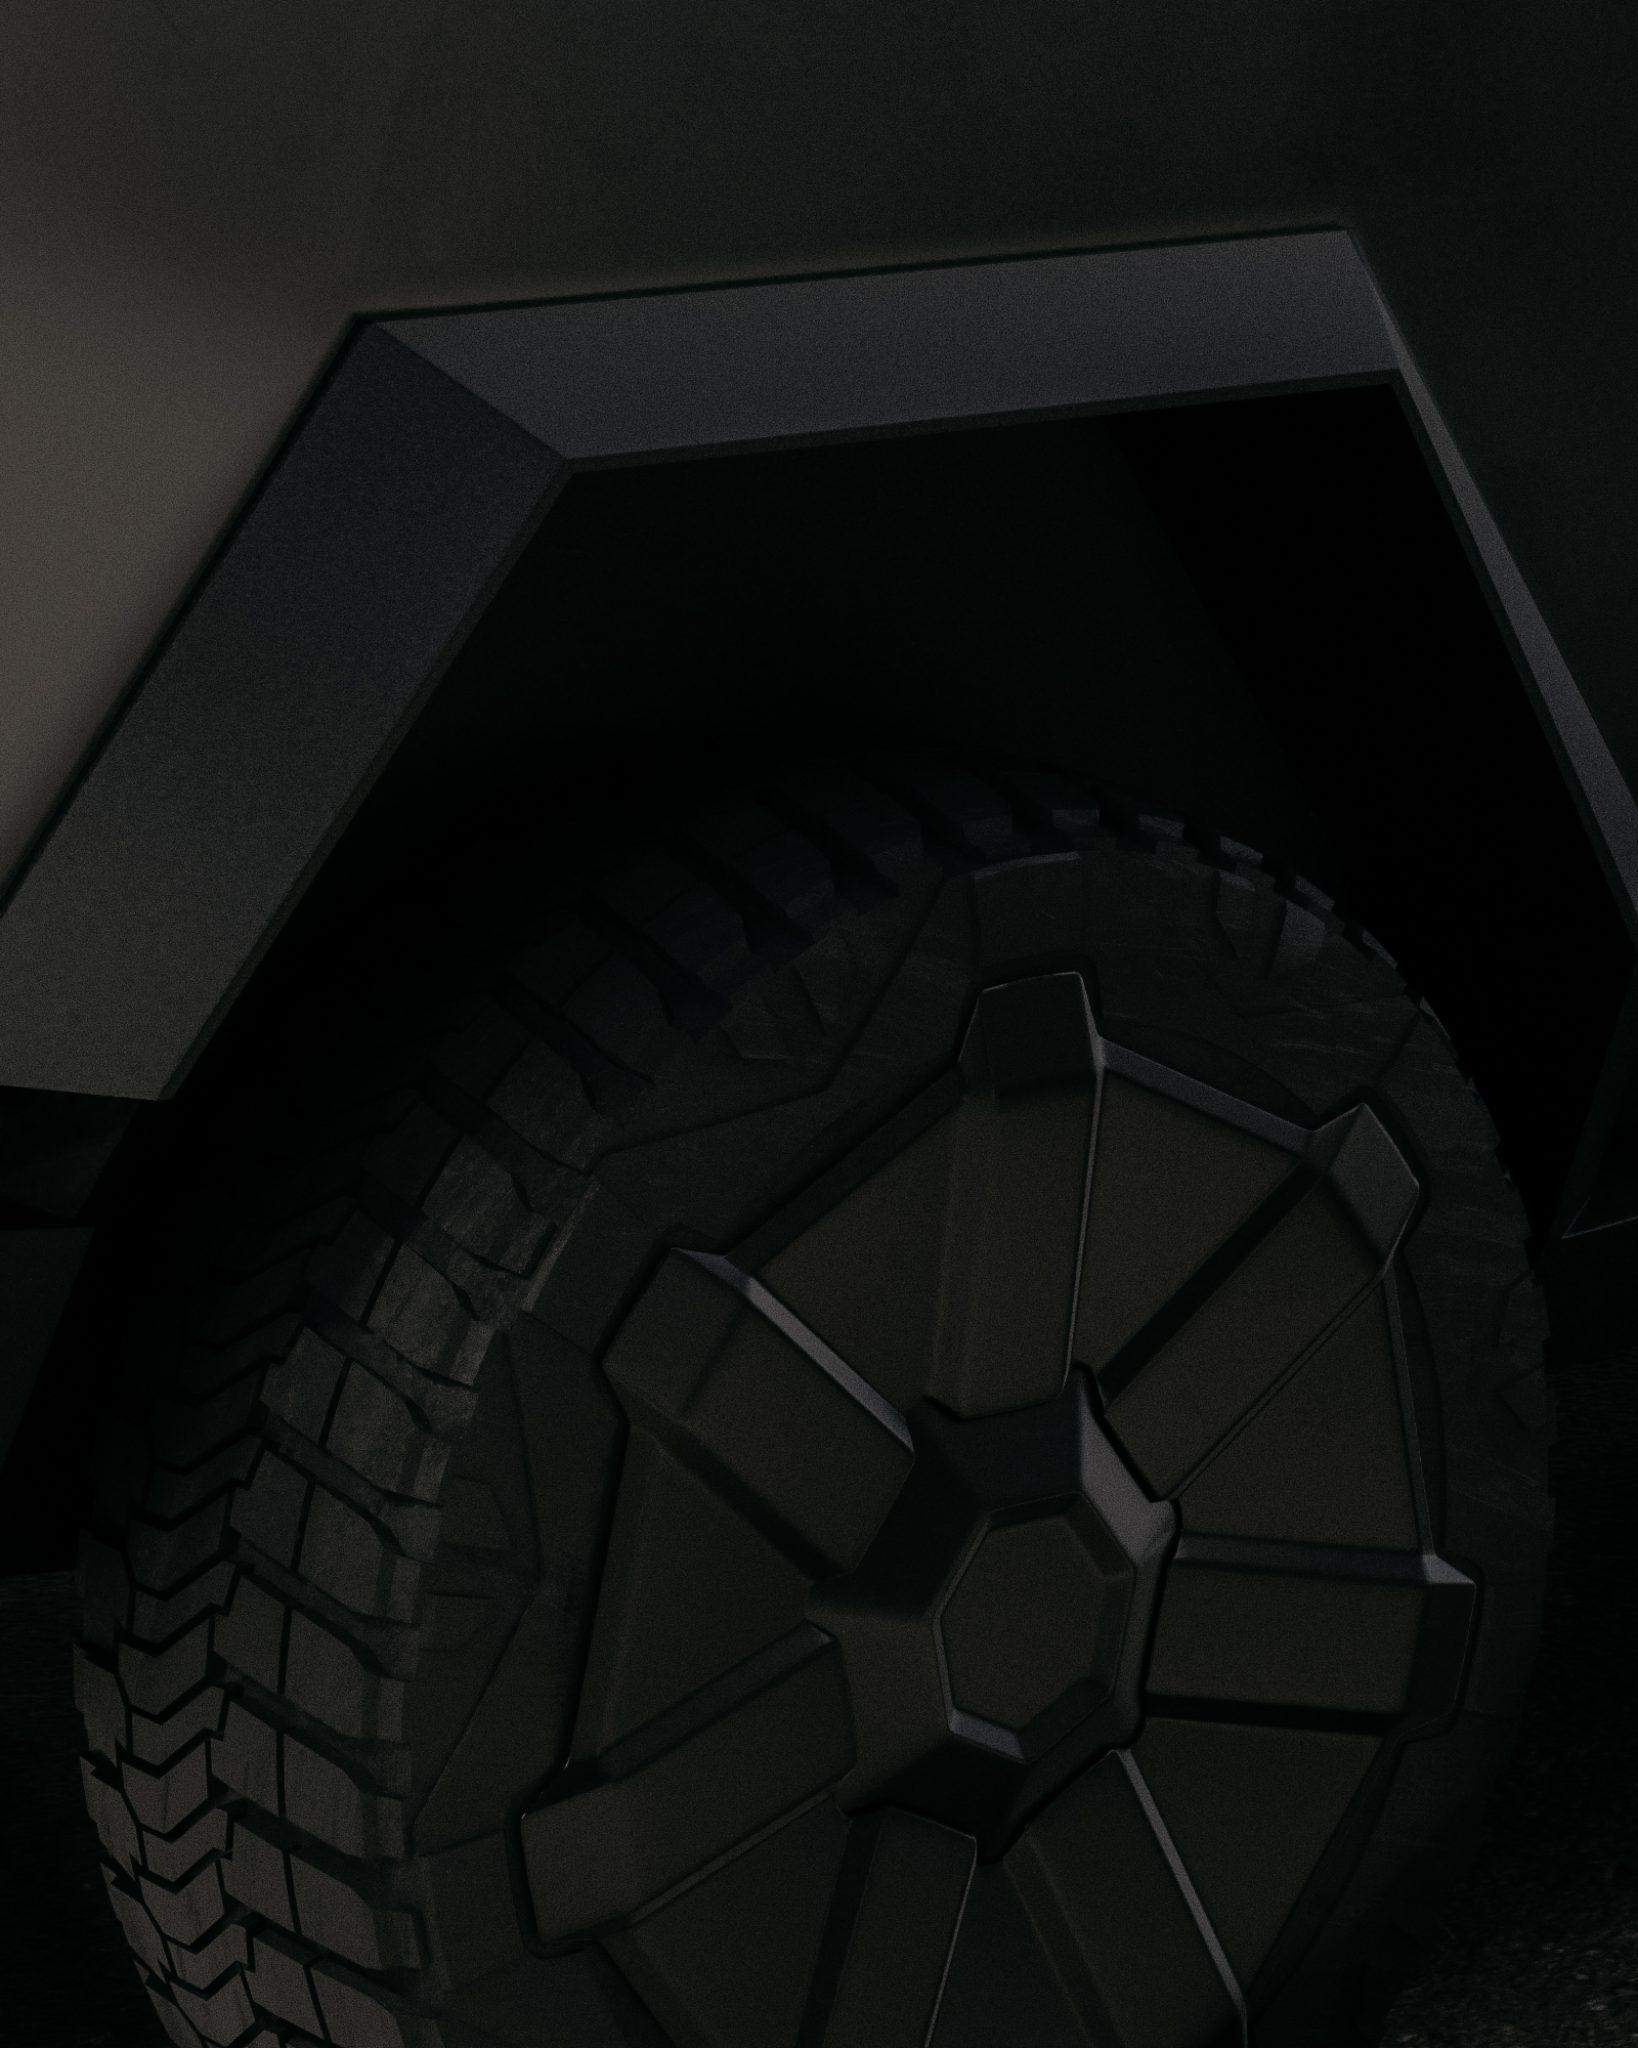 ignant-tesla-cybertruck-cgi-brutalism-cgi-editorial-9-1638×2048